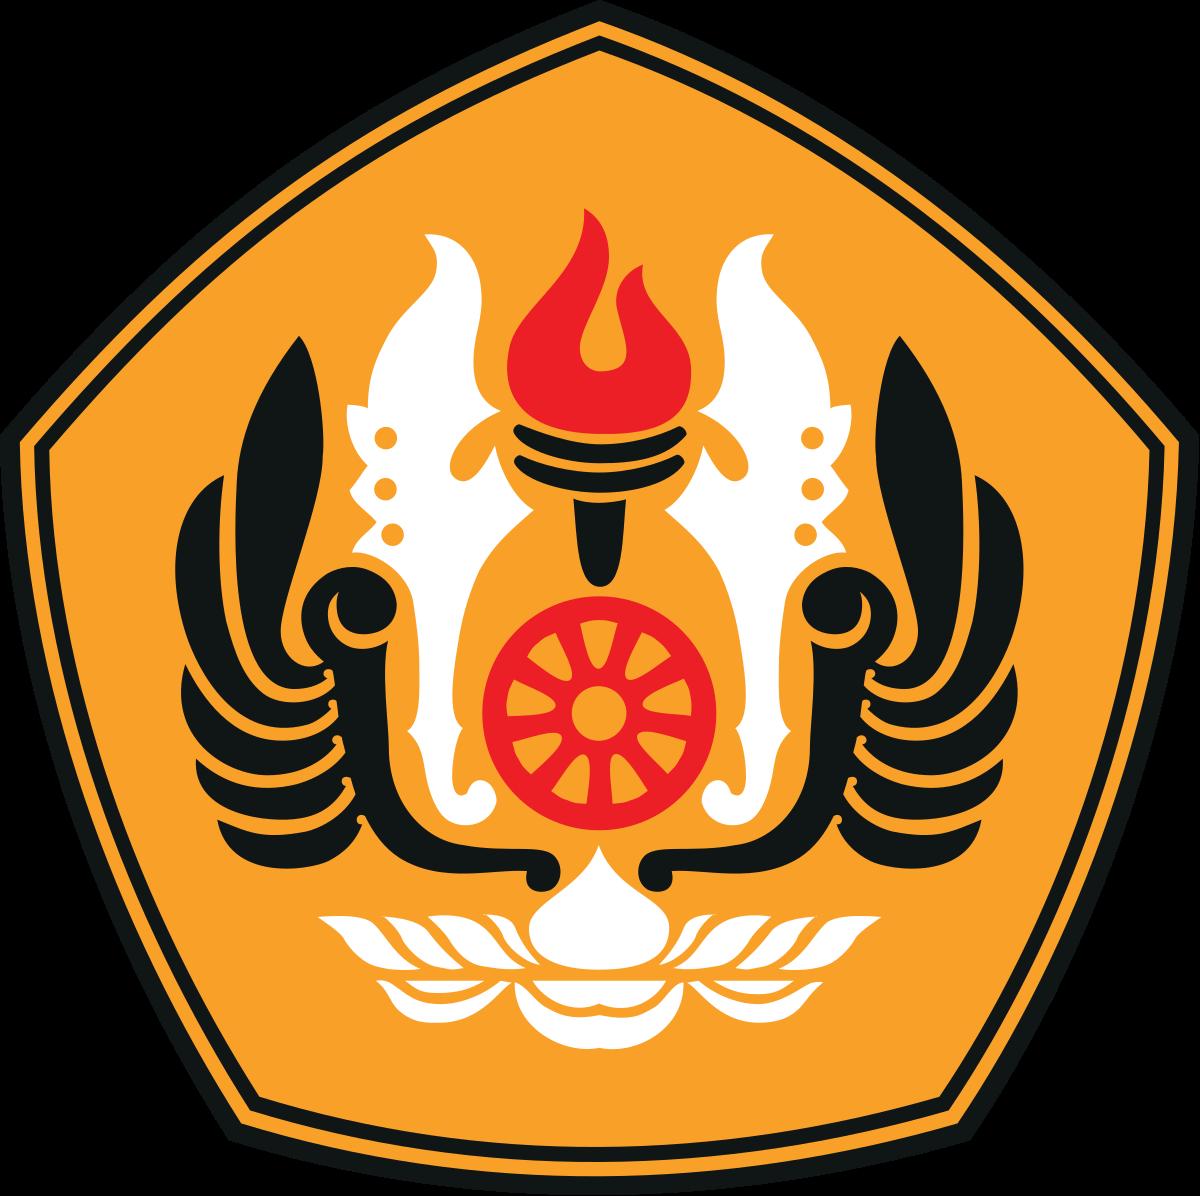 Universitas Padjadjaran (UNPAD)